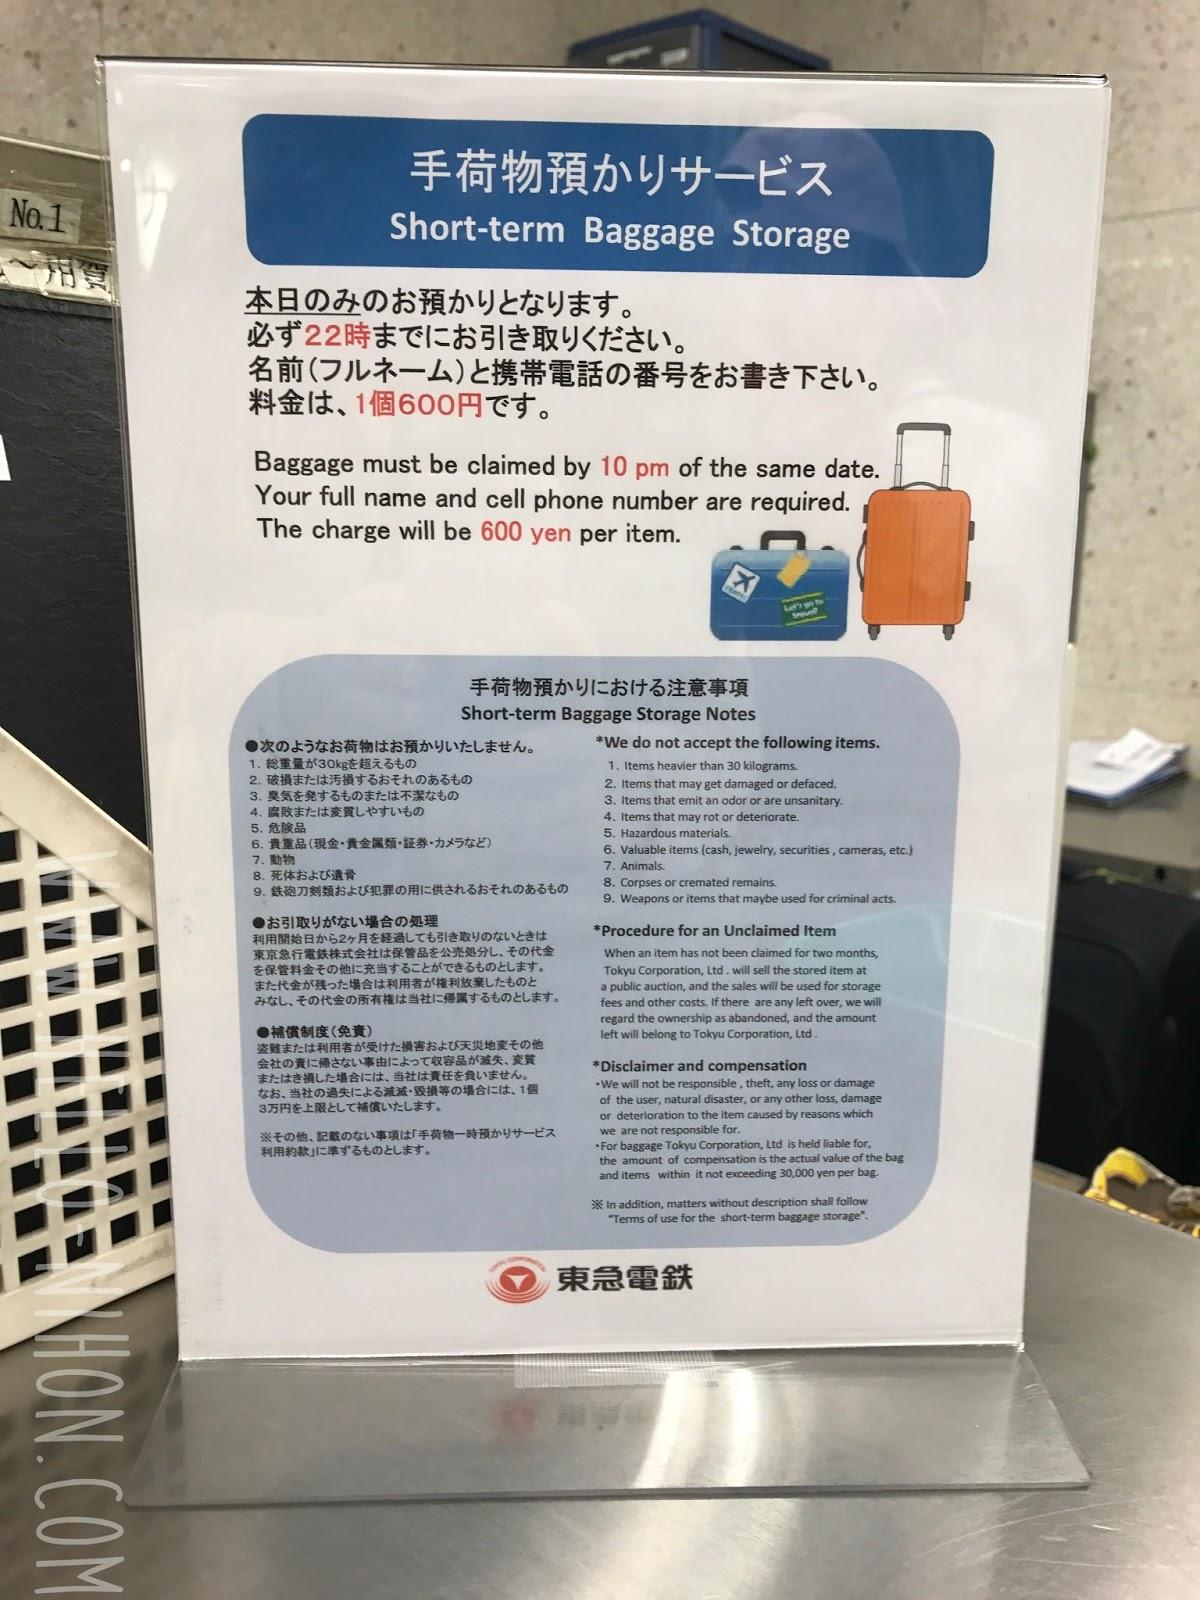 Shia Station Baggage Storage